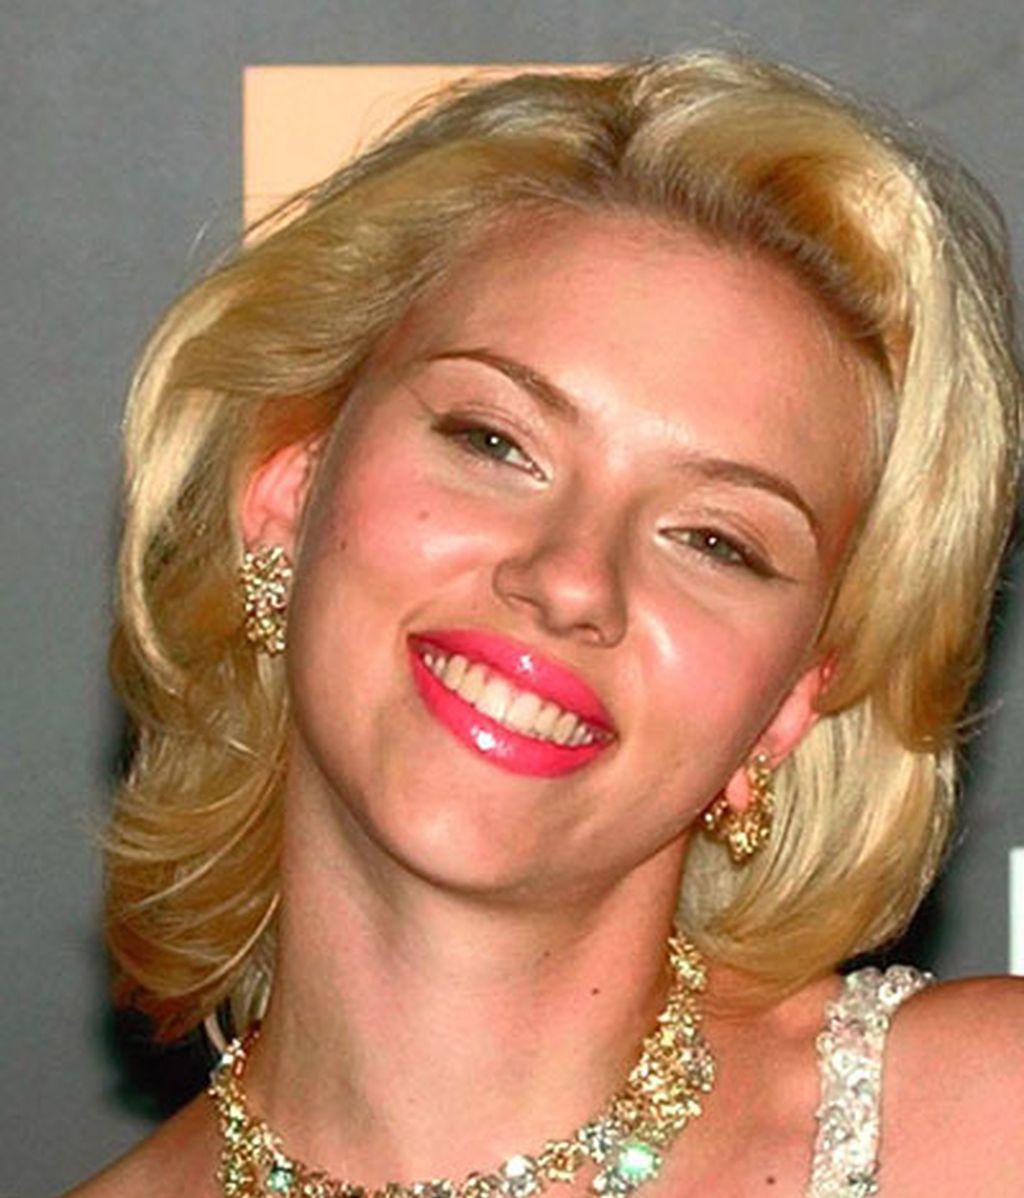 Scarlett Johansson vs. Marilyn Monroe